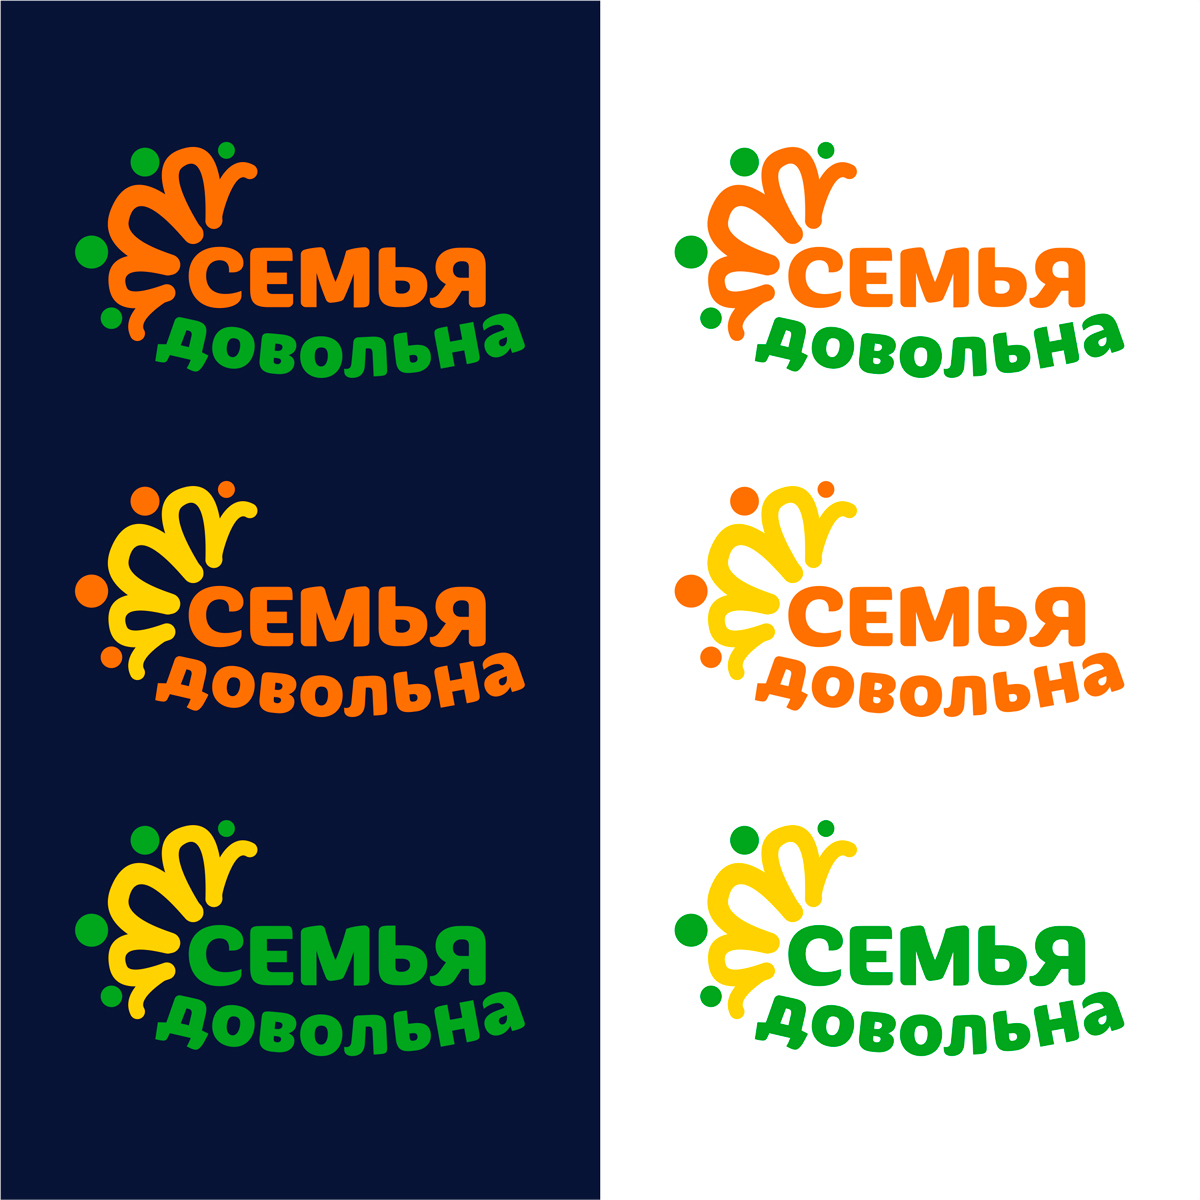 "Разработайте логотип для торговой марки ""Семья довольна"" фото f_3045b9fcd9bb1231.jpg"